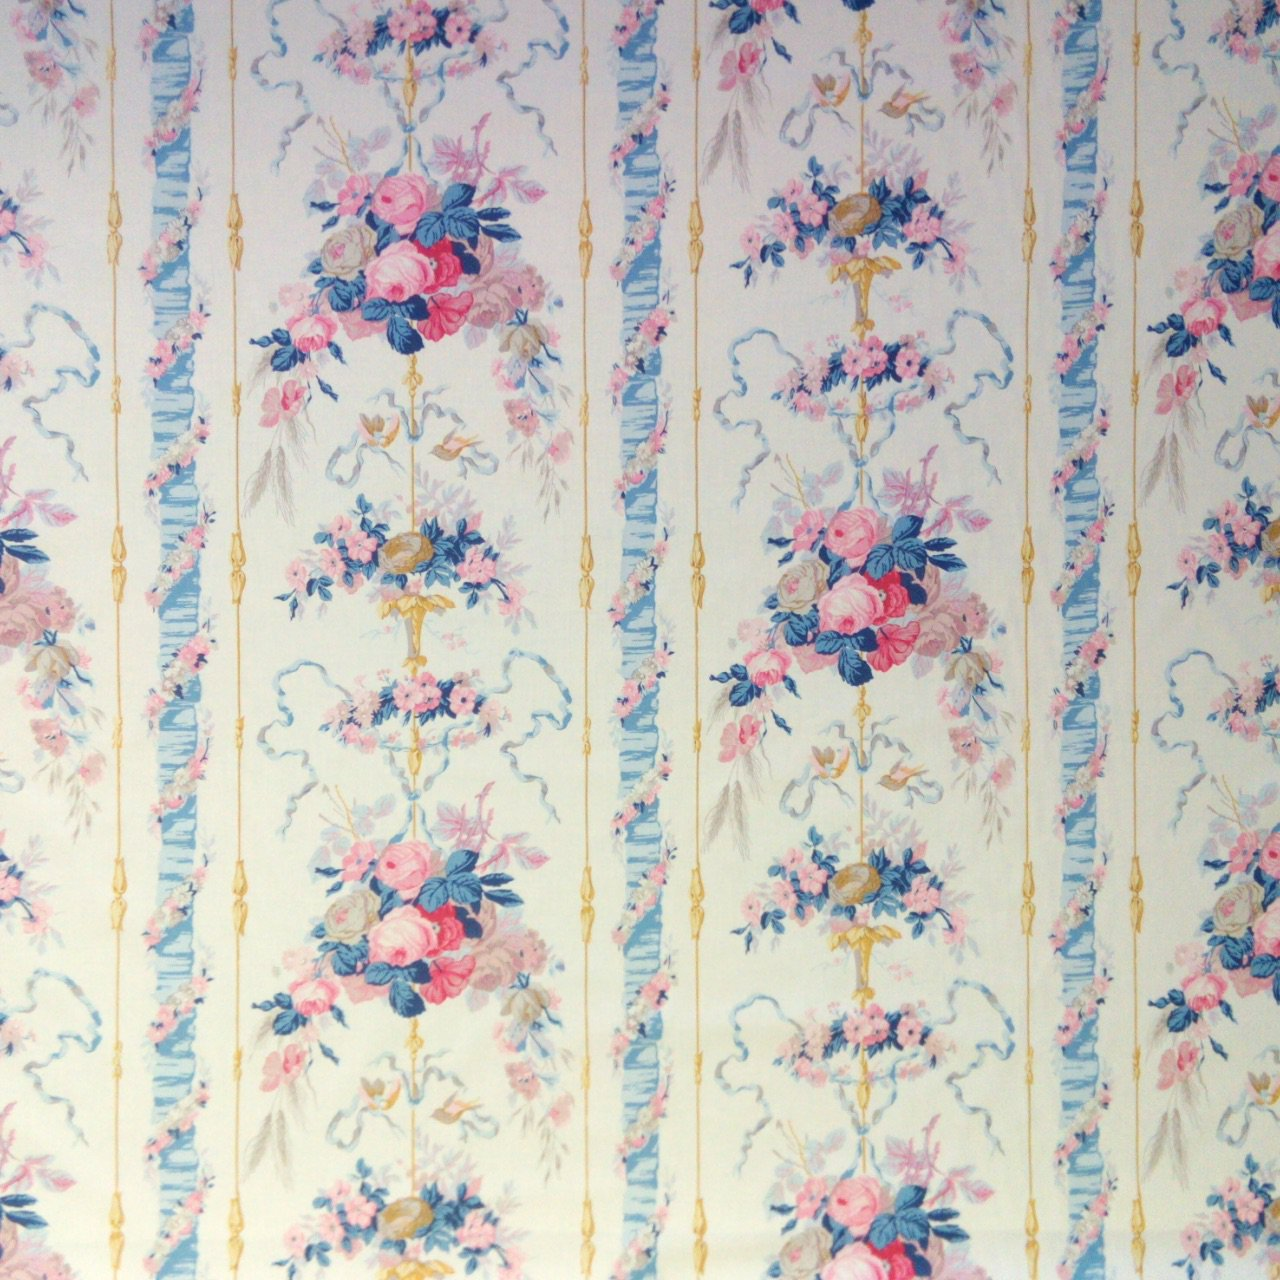 fabric/ファブリック/生地 コットン100% フラワープリント 《ランバル公妃》 クリーム by Charles Burger (シャールブルジェ)